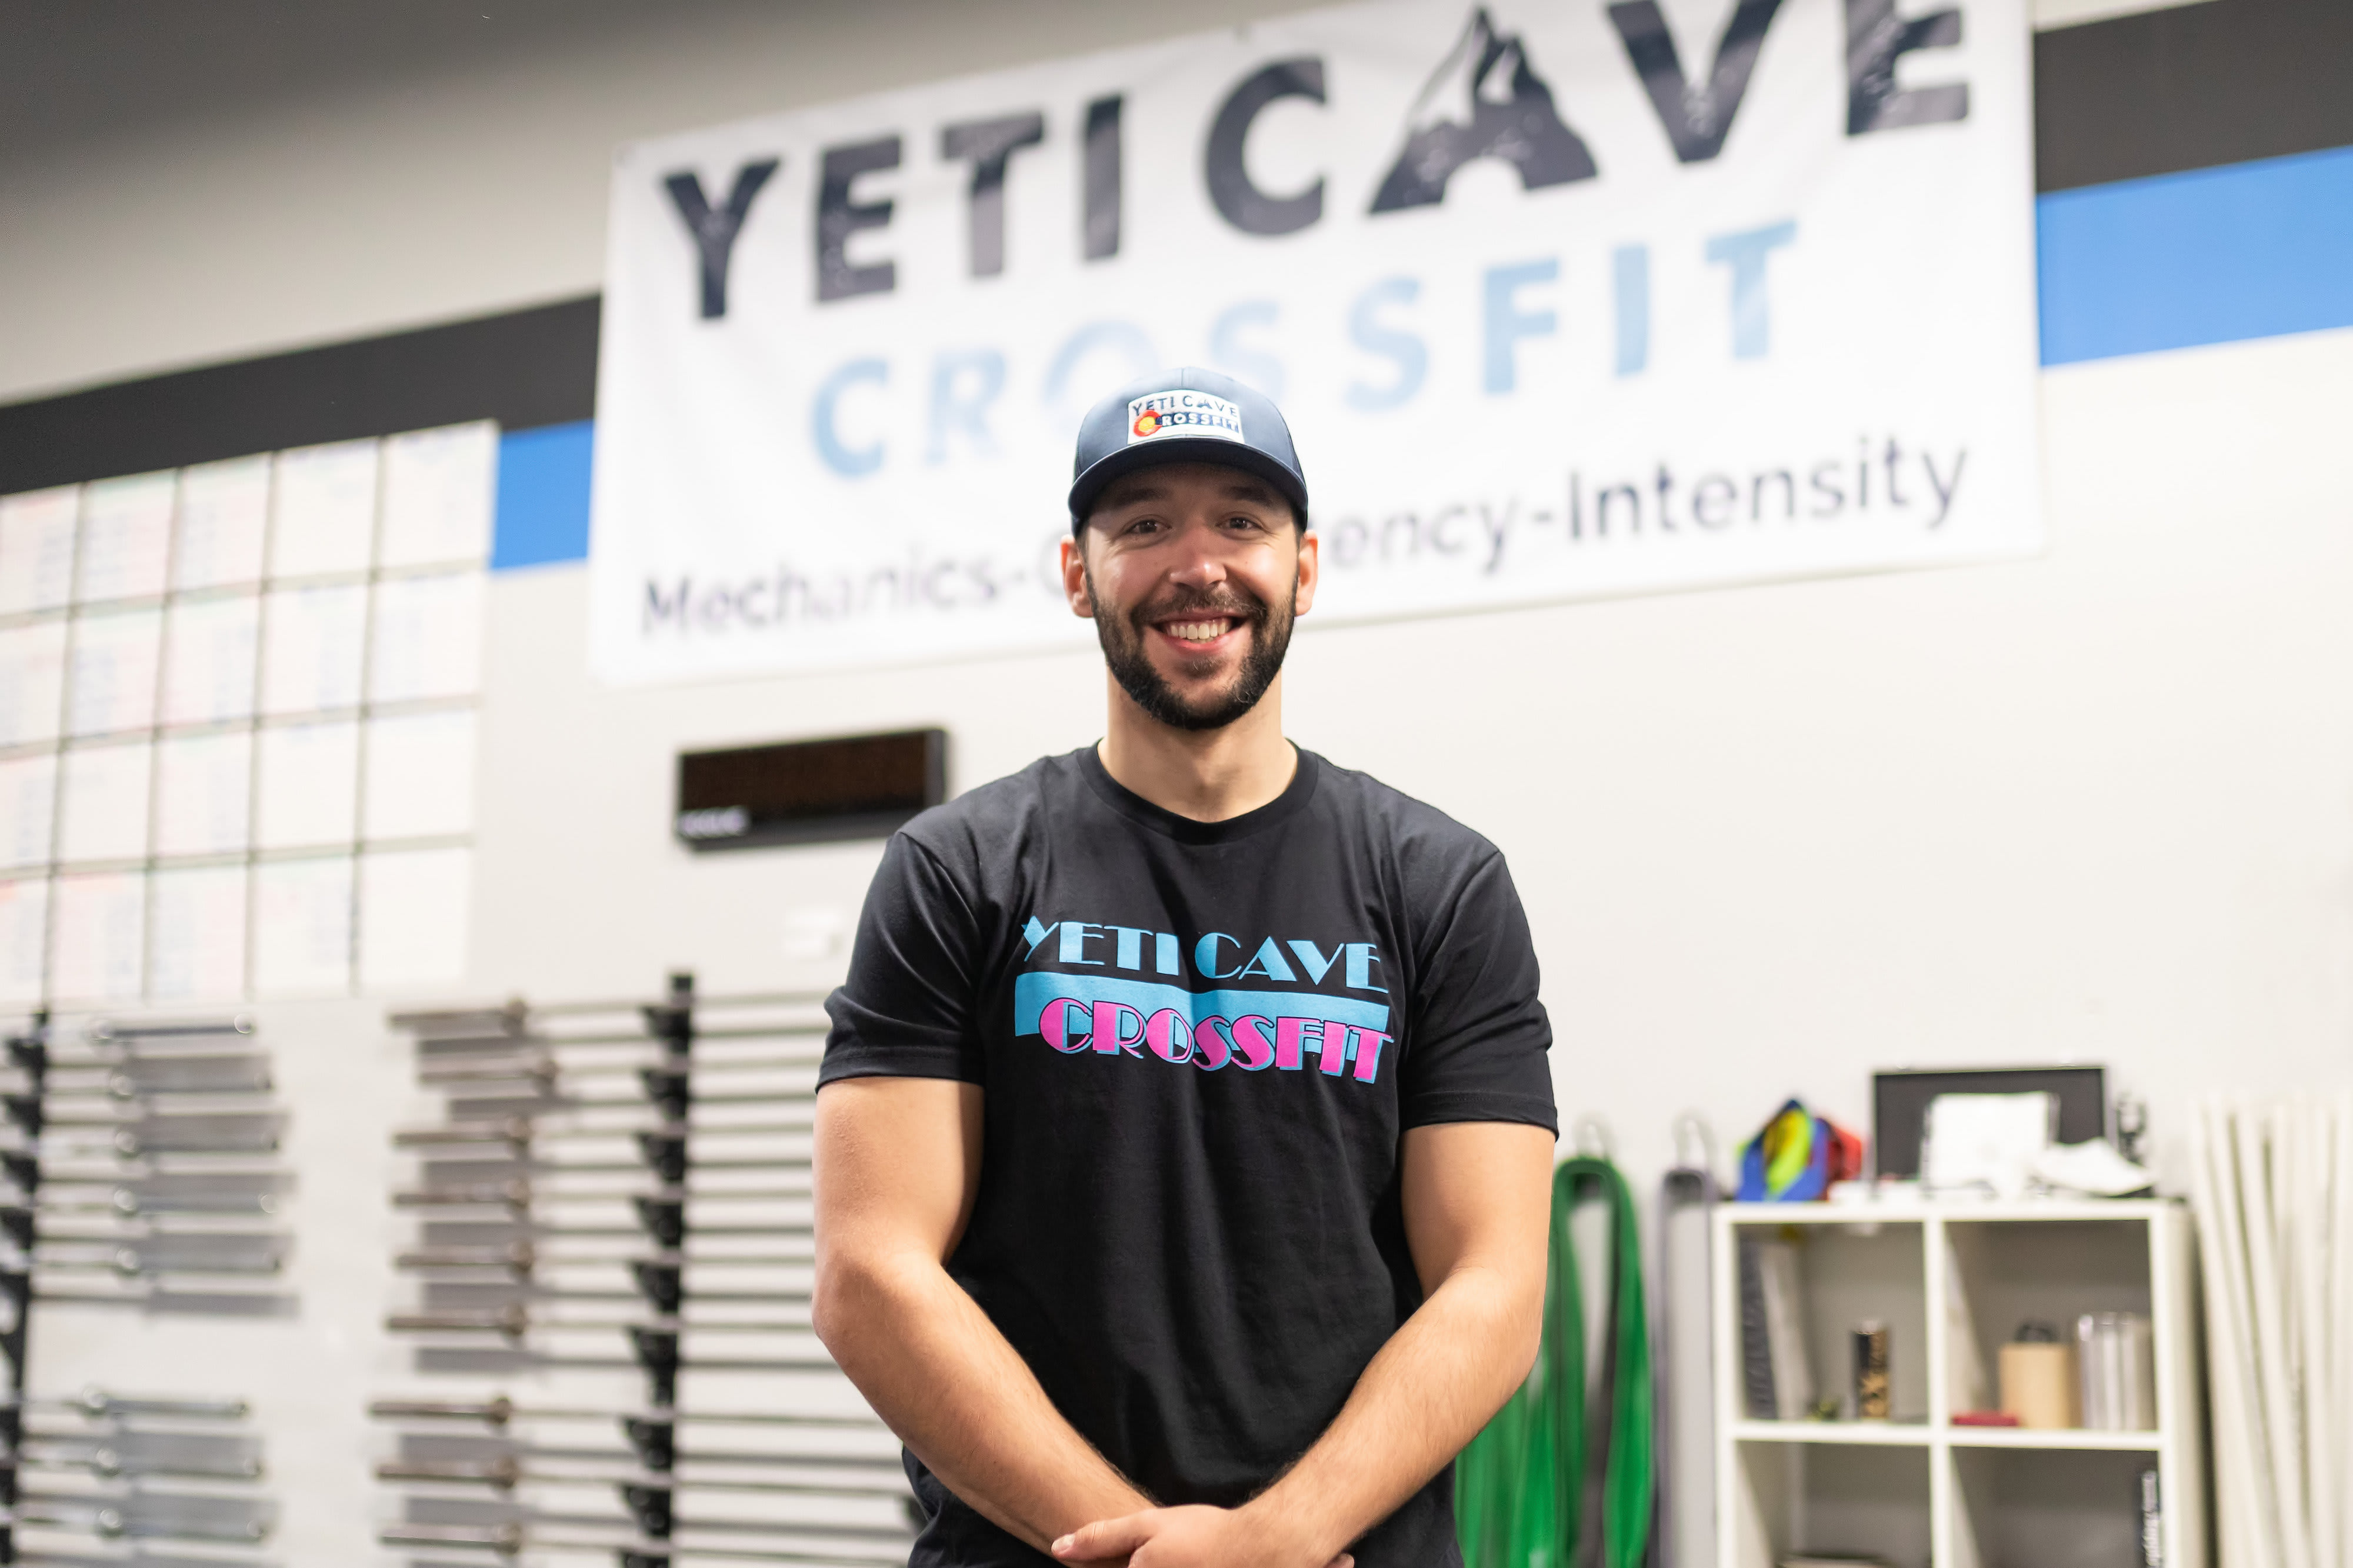 Nate Landsgaard in Fort Collins - Yeti Cave CrossFit